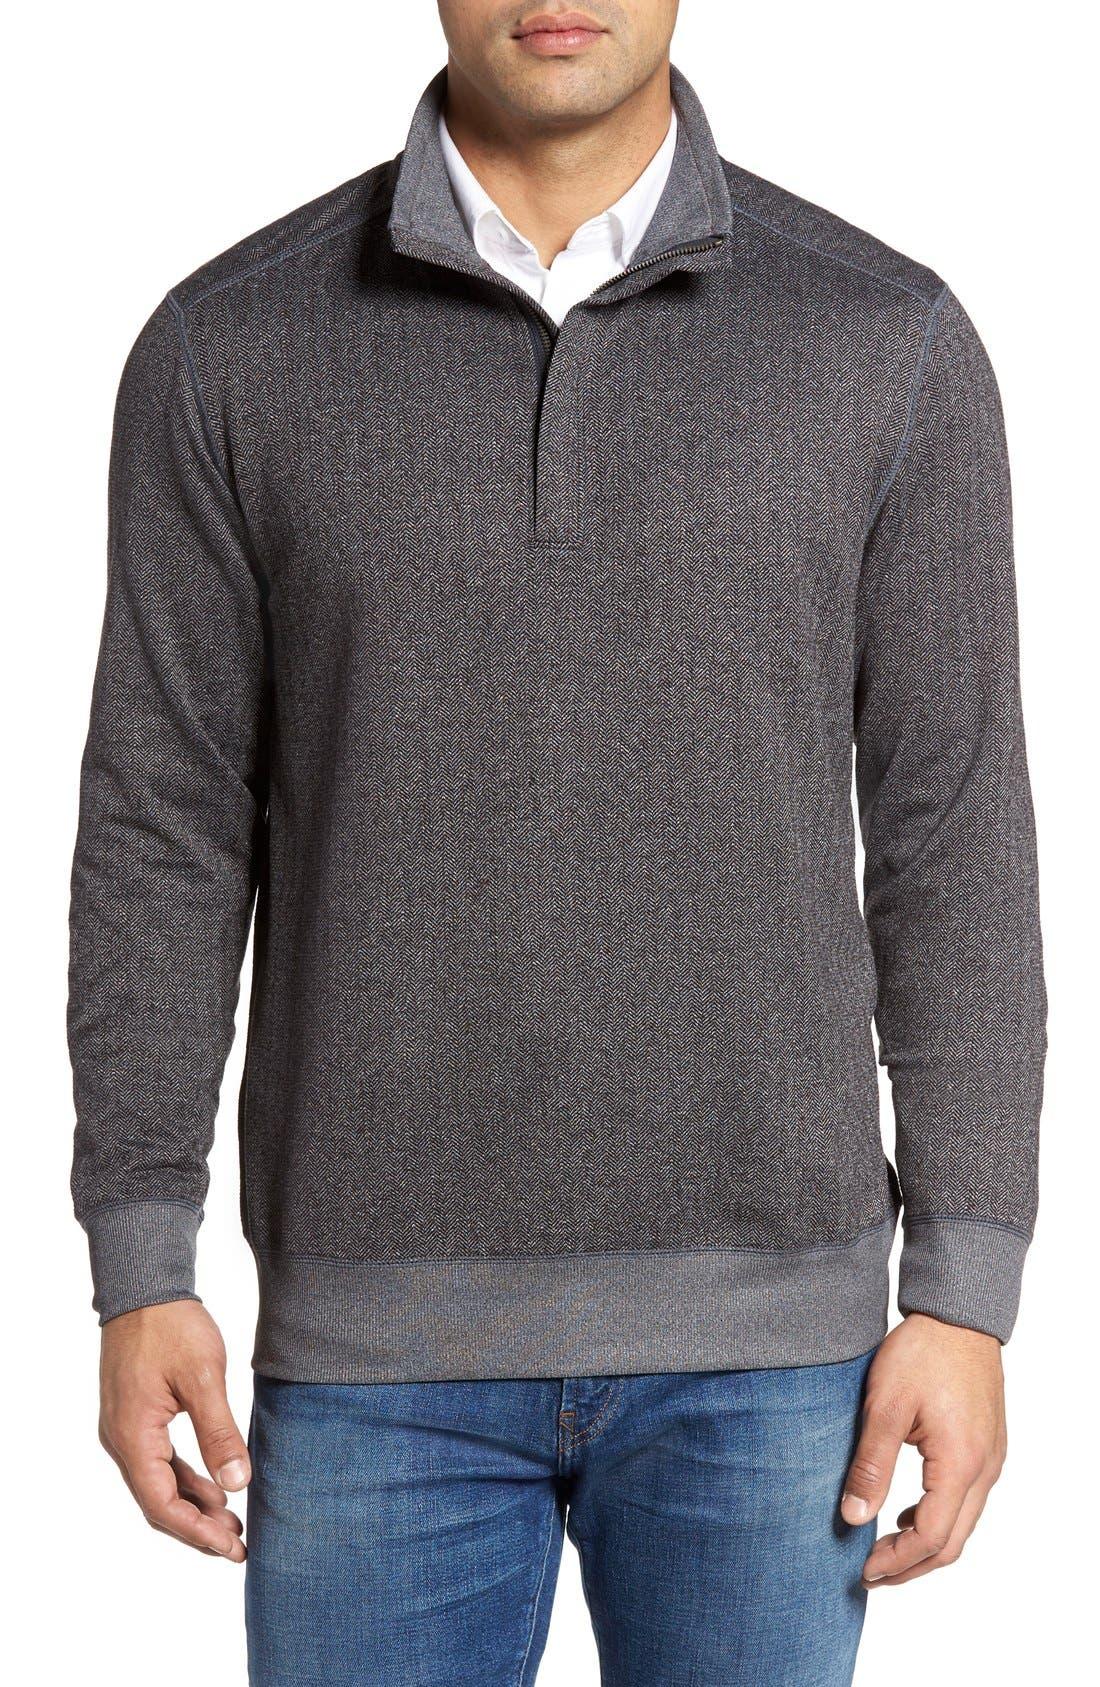 Pro Formance Quarter Zip Sweater,                             Main thumbnail 1, color,                             Coal Heather